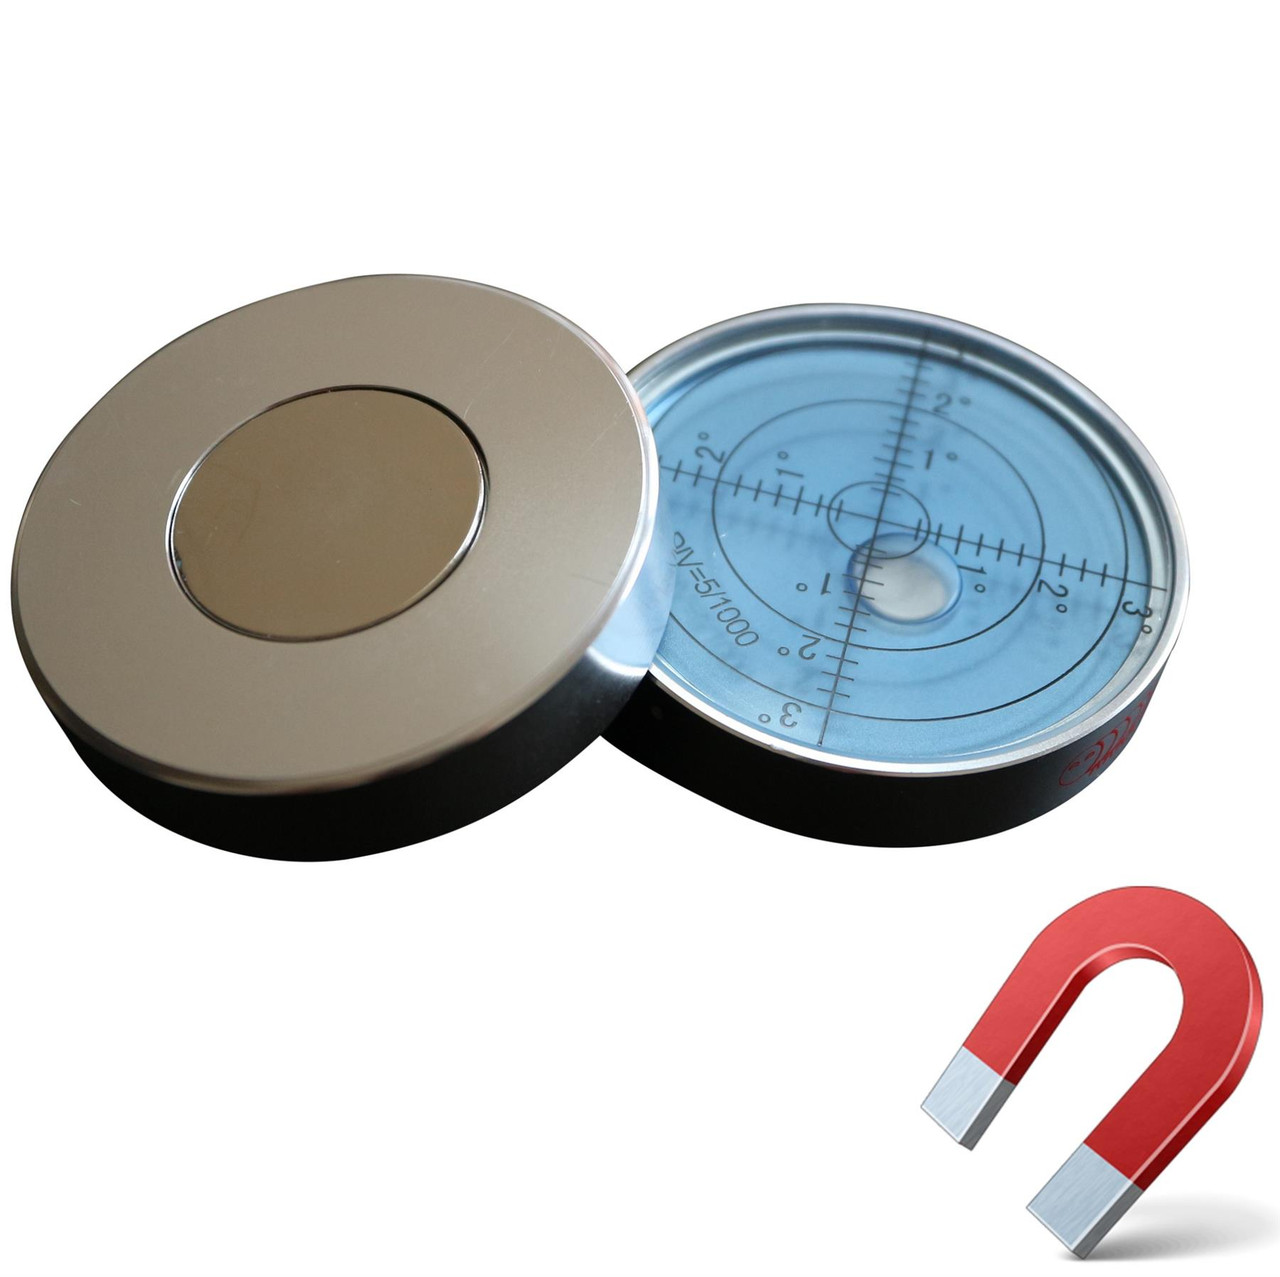 Green//Black Circular Metal Housing Surface Level Magnetic Metal Large Spirit Bubble Level 60mm Diameter Degrees Bulls Eye Bullseye Vial Round